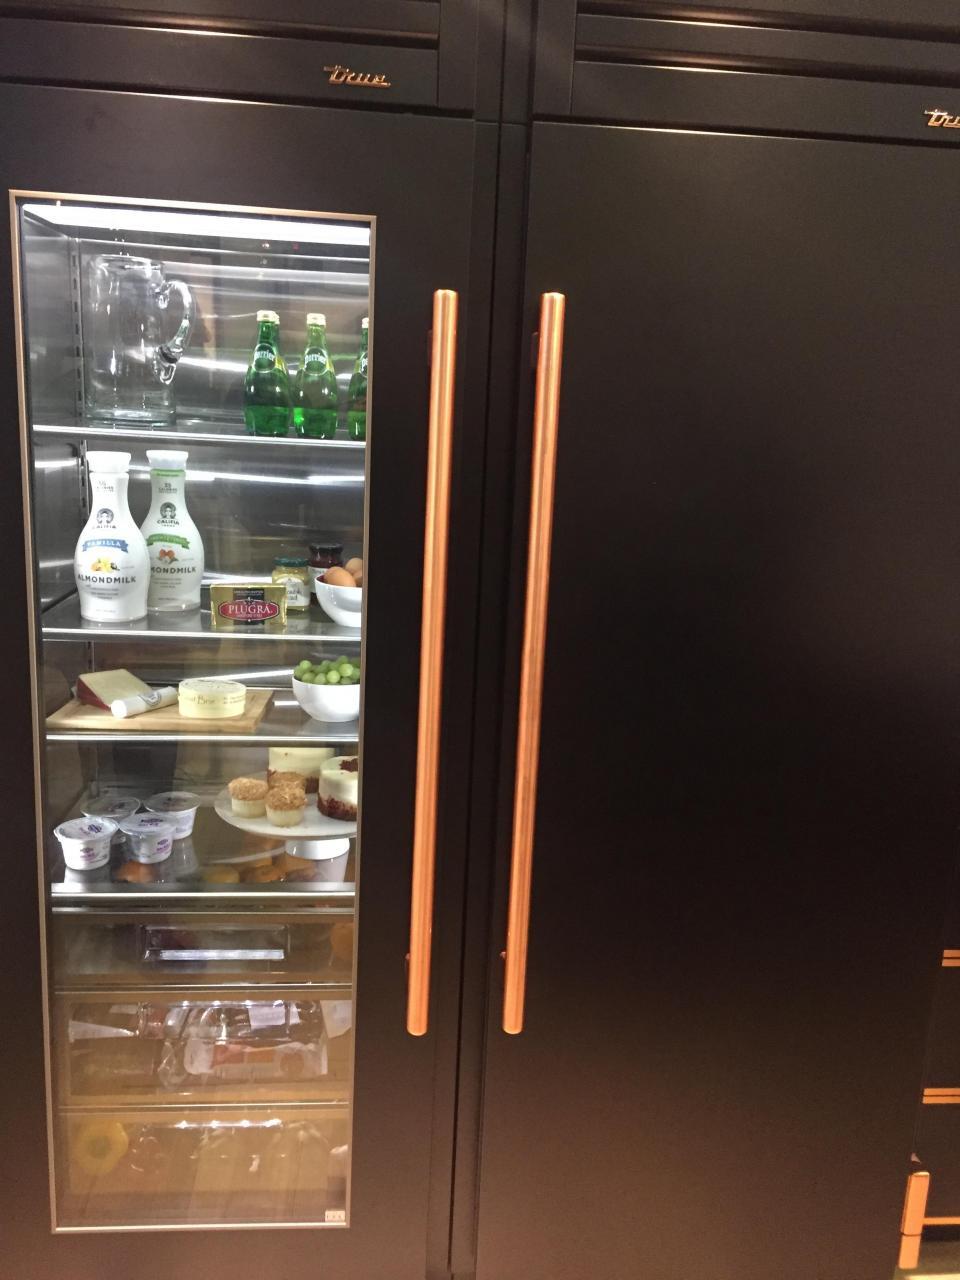 True refrigerator columns